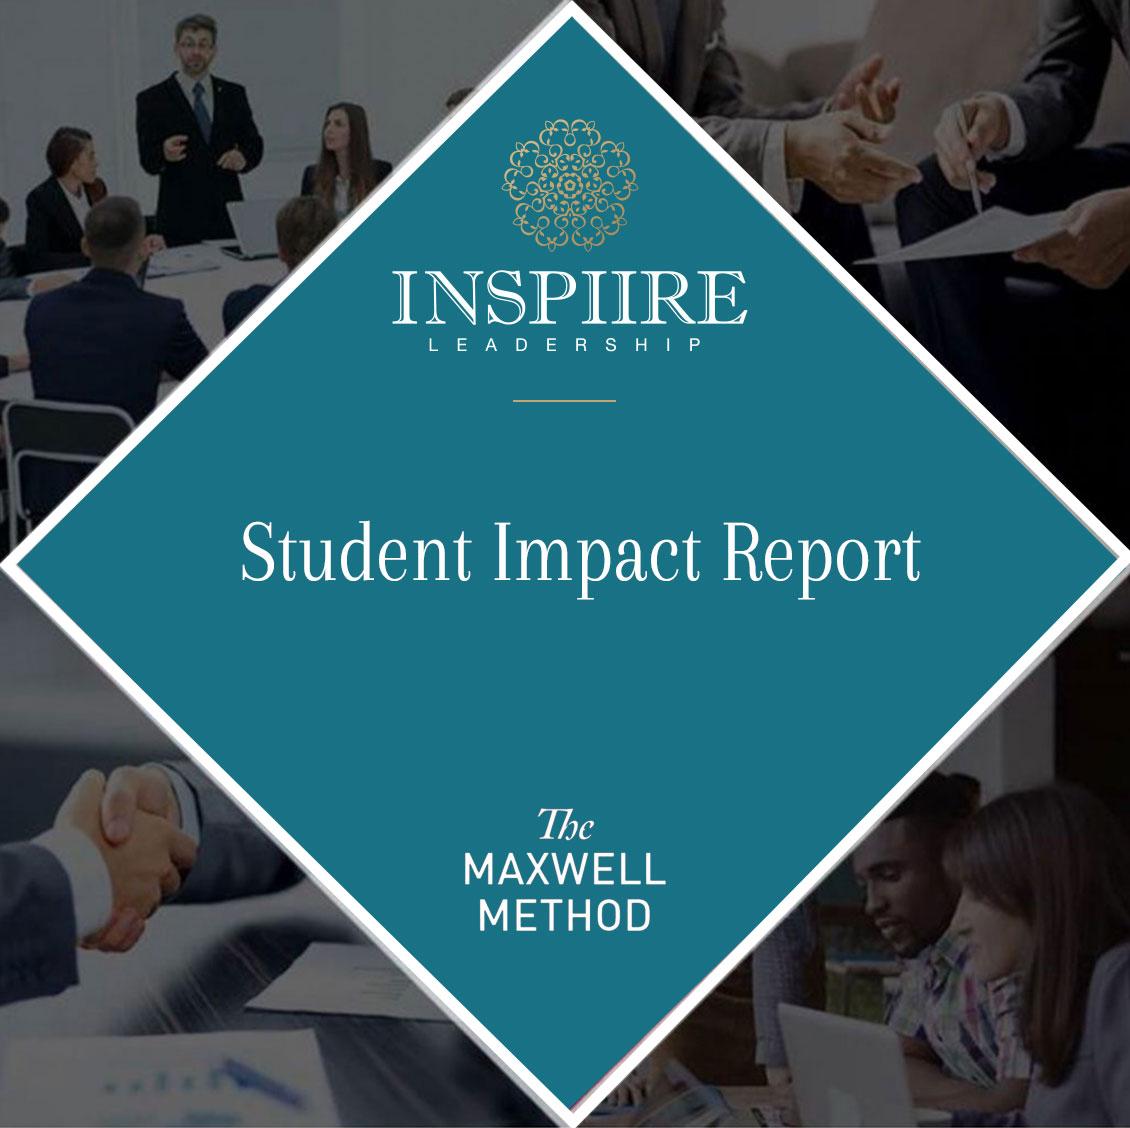 John-Maxwell-Student-Impact-Report-Shellinda-Miller